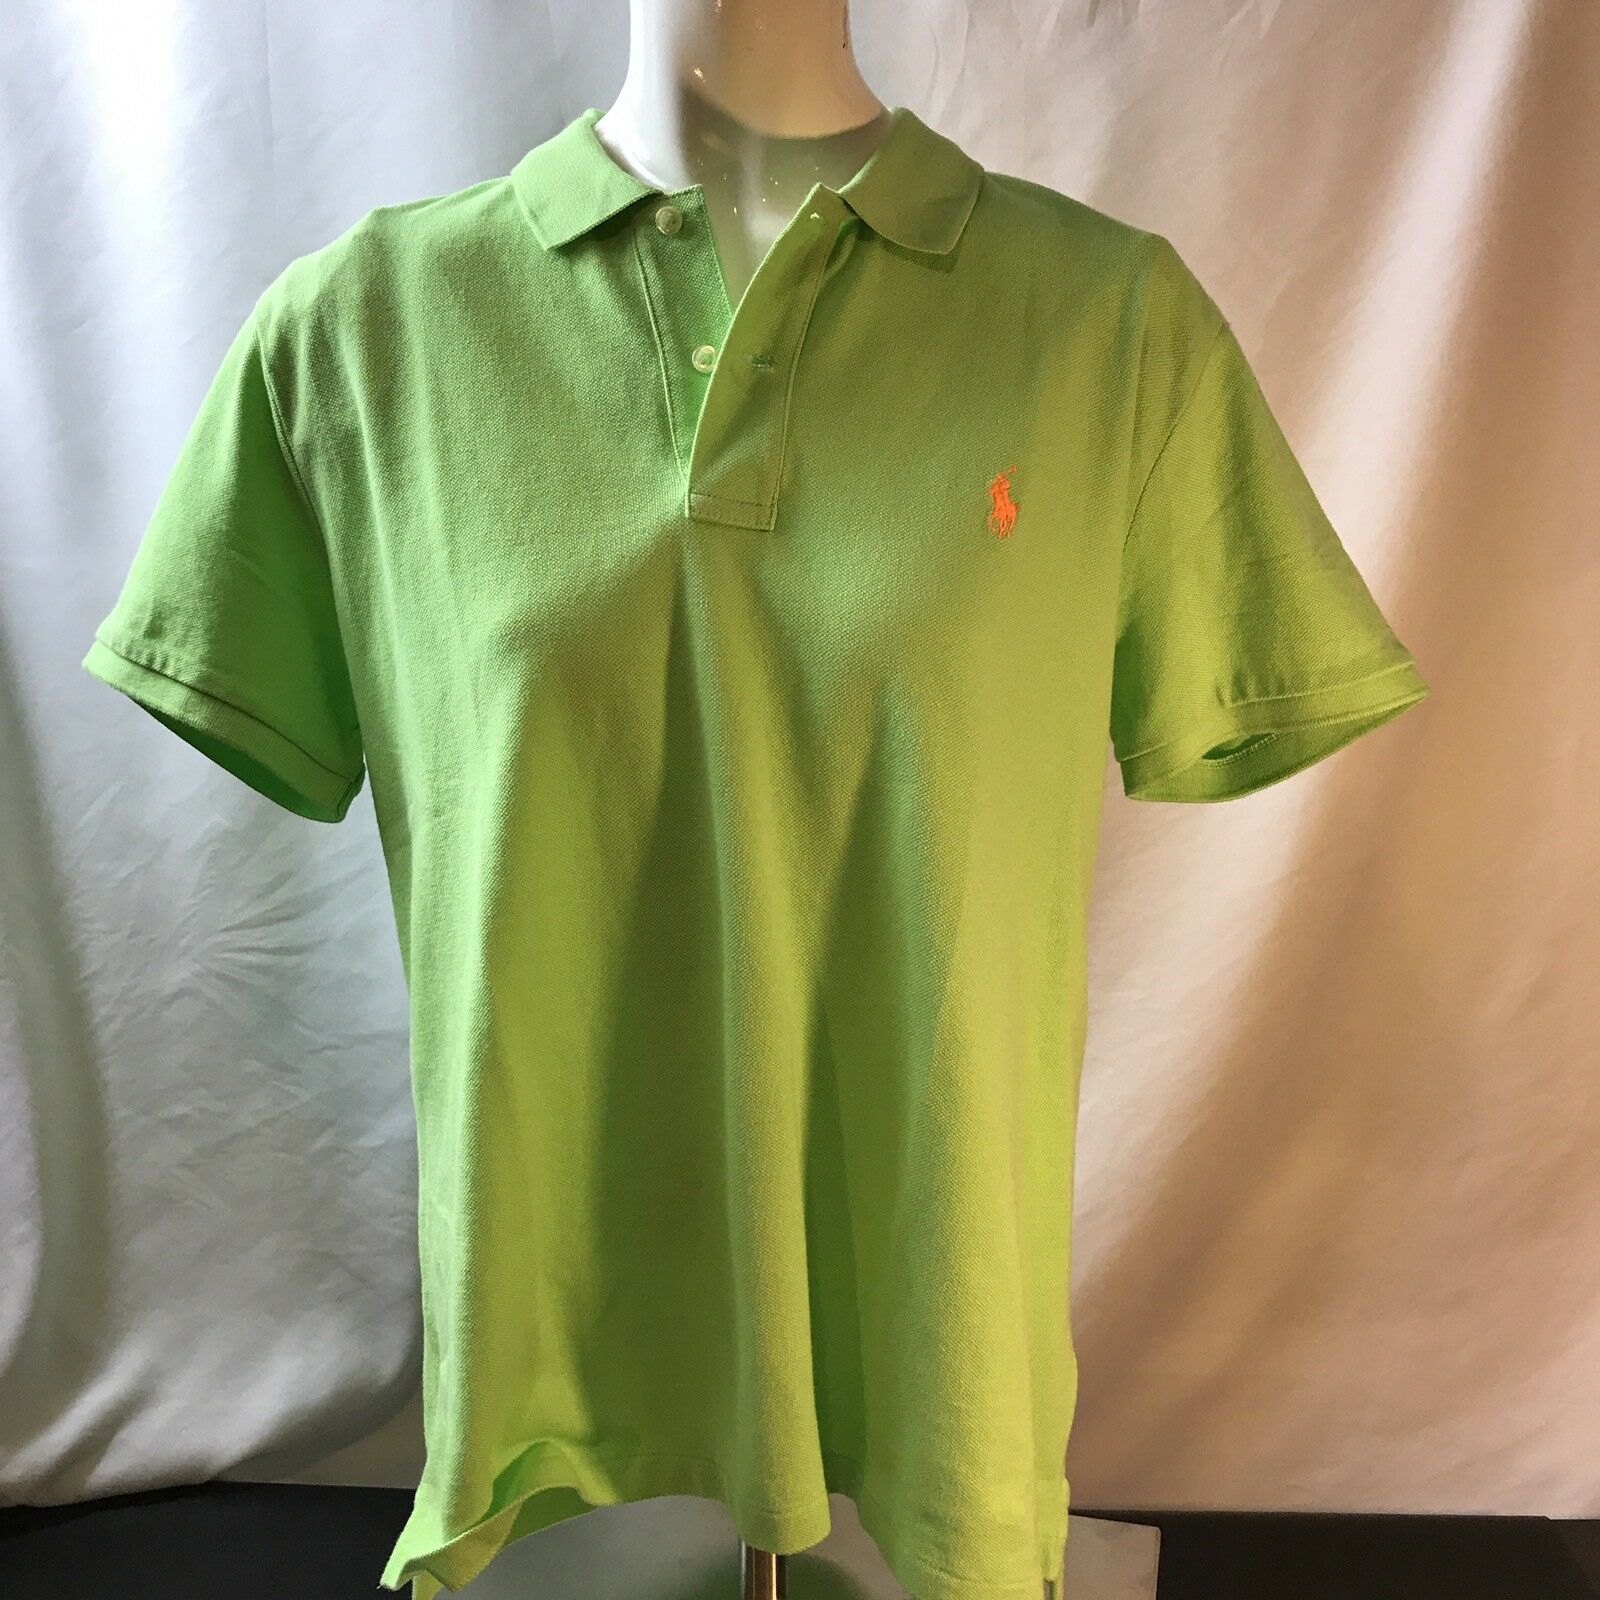 New Polo Ralph Lauren Classic Fit Cotton Mesh Shirt sz Sml Florida Green orange